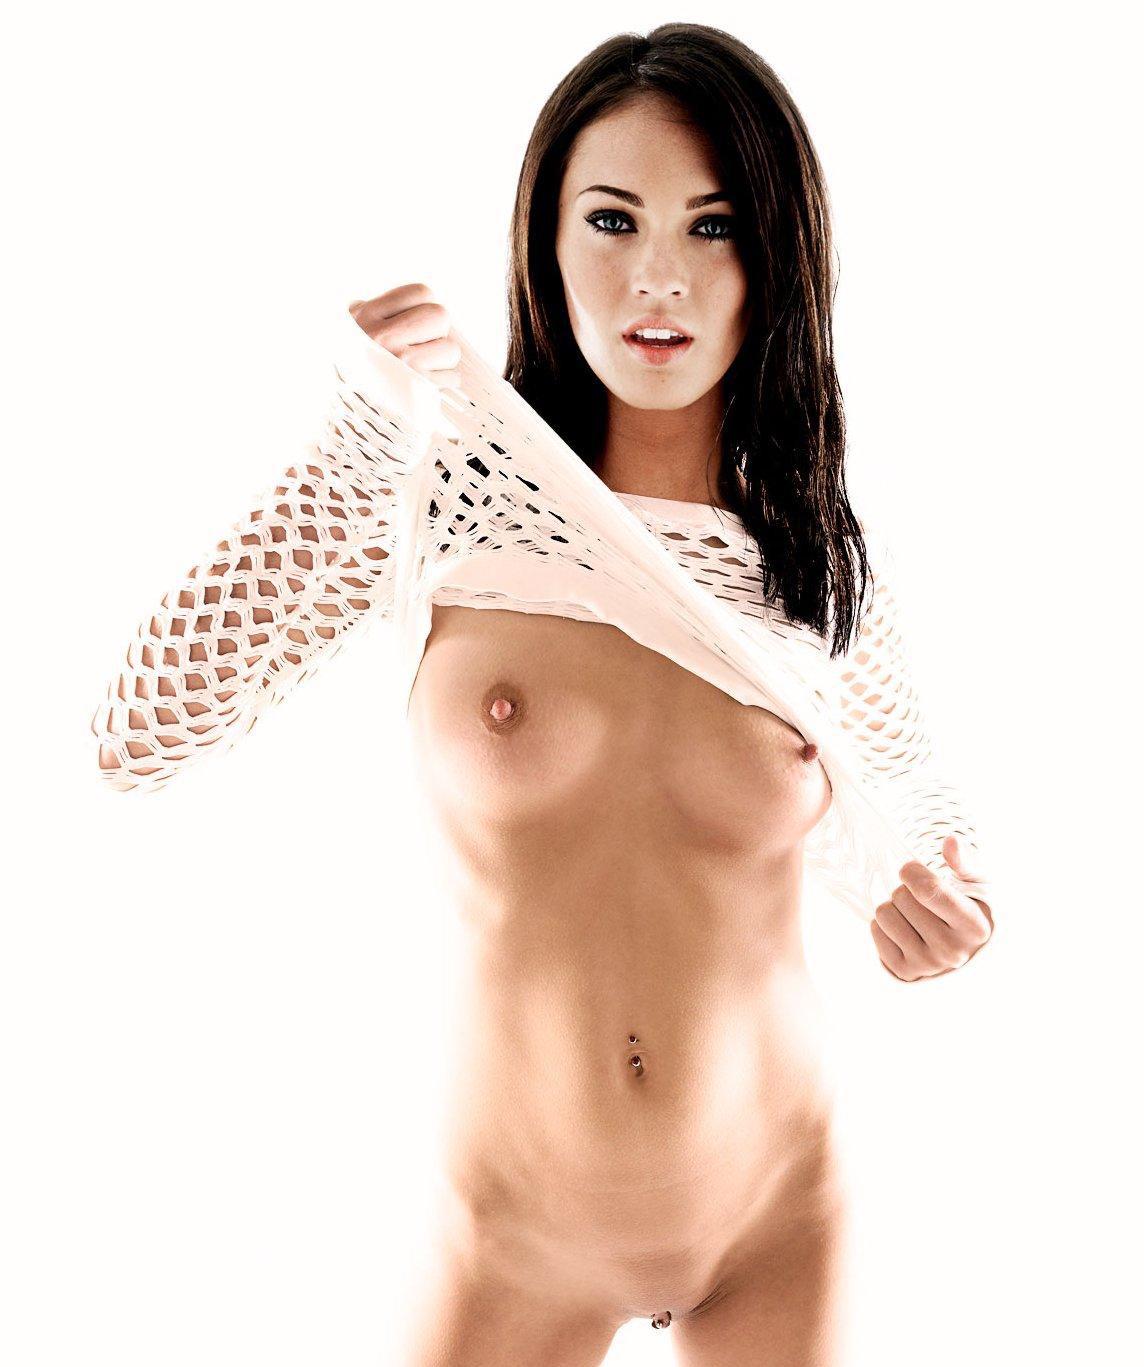 Megan Fox Exposing Boobs